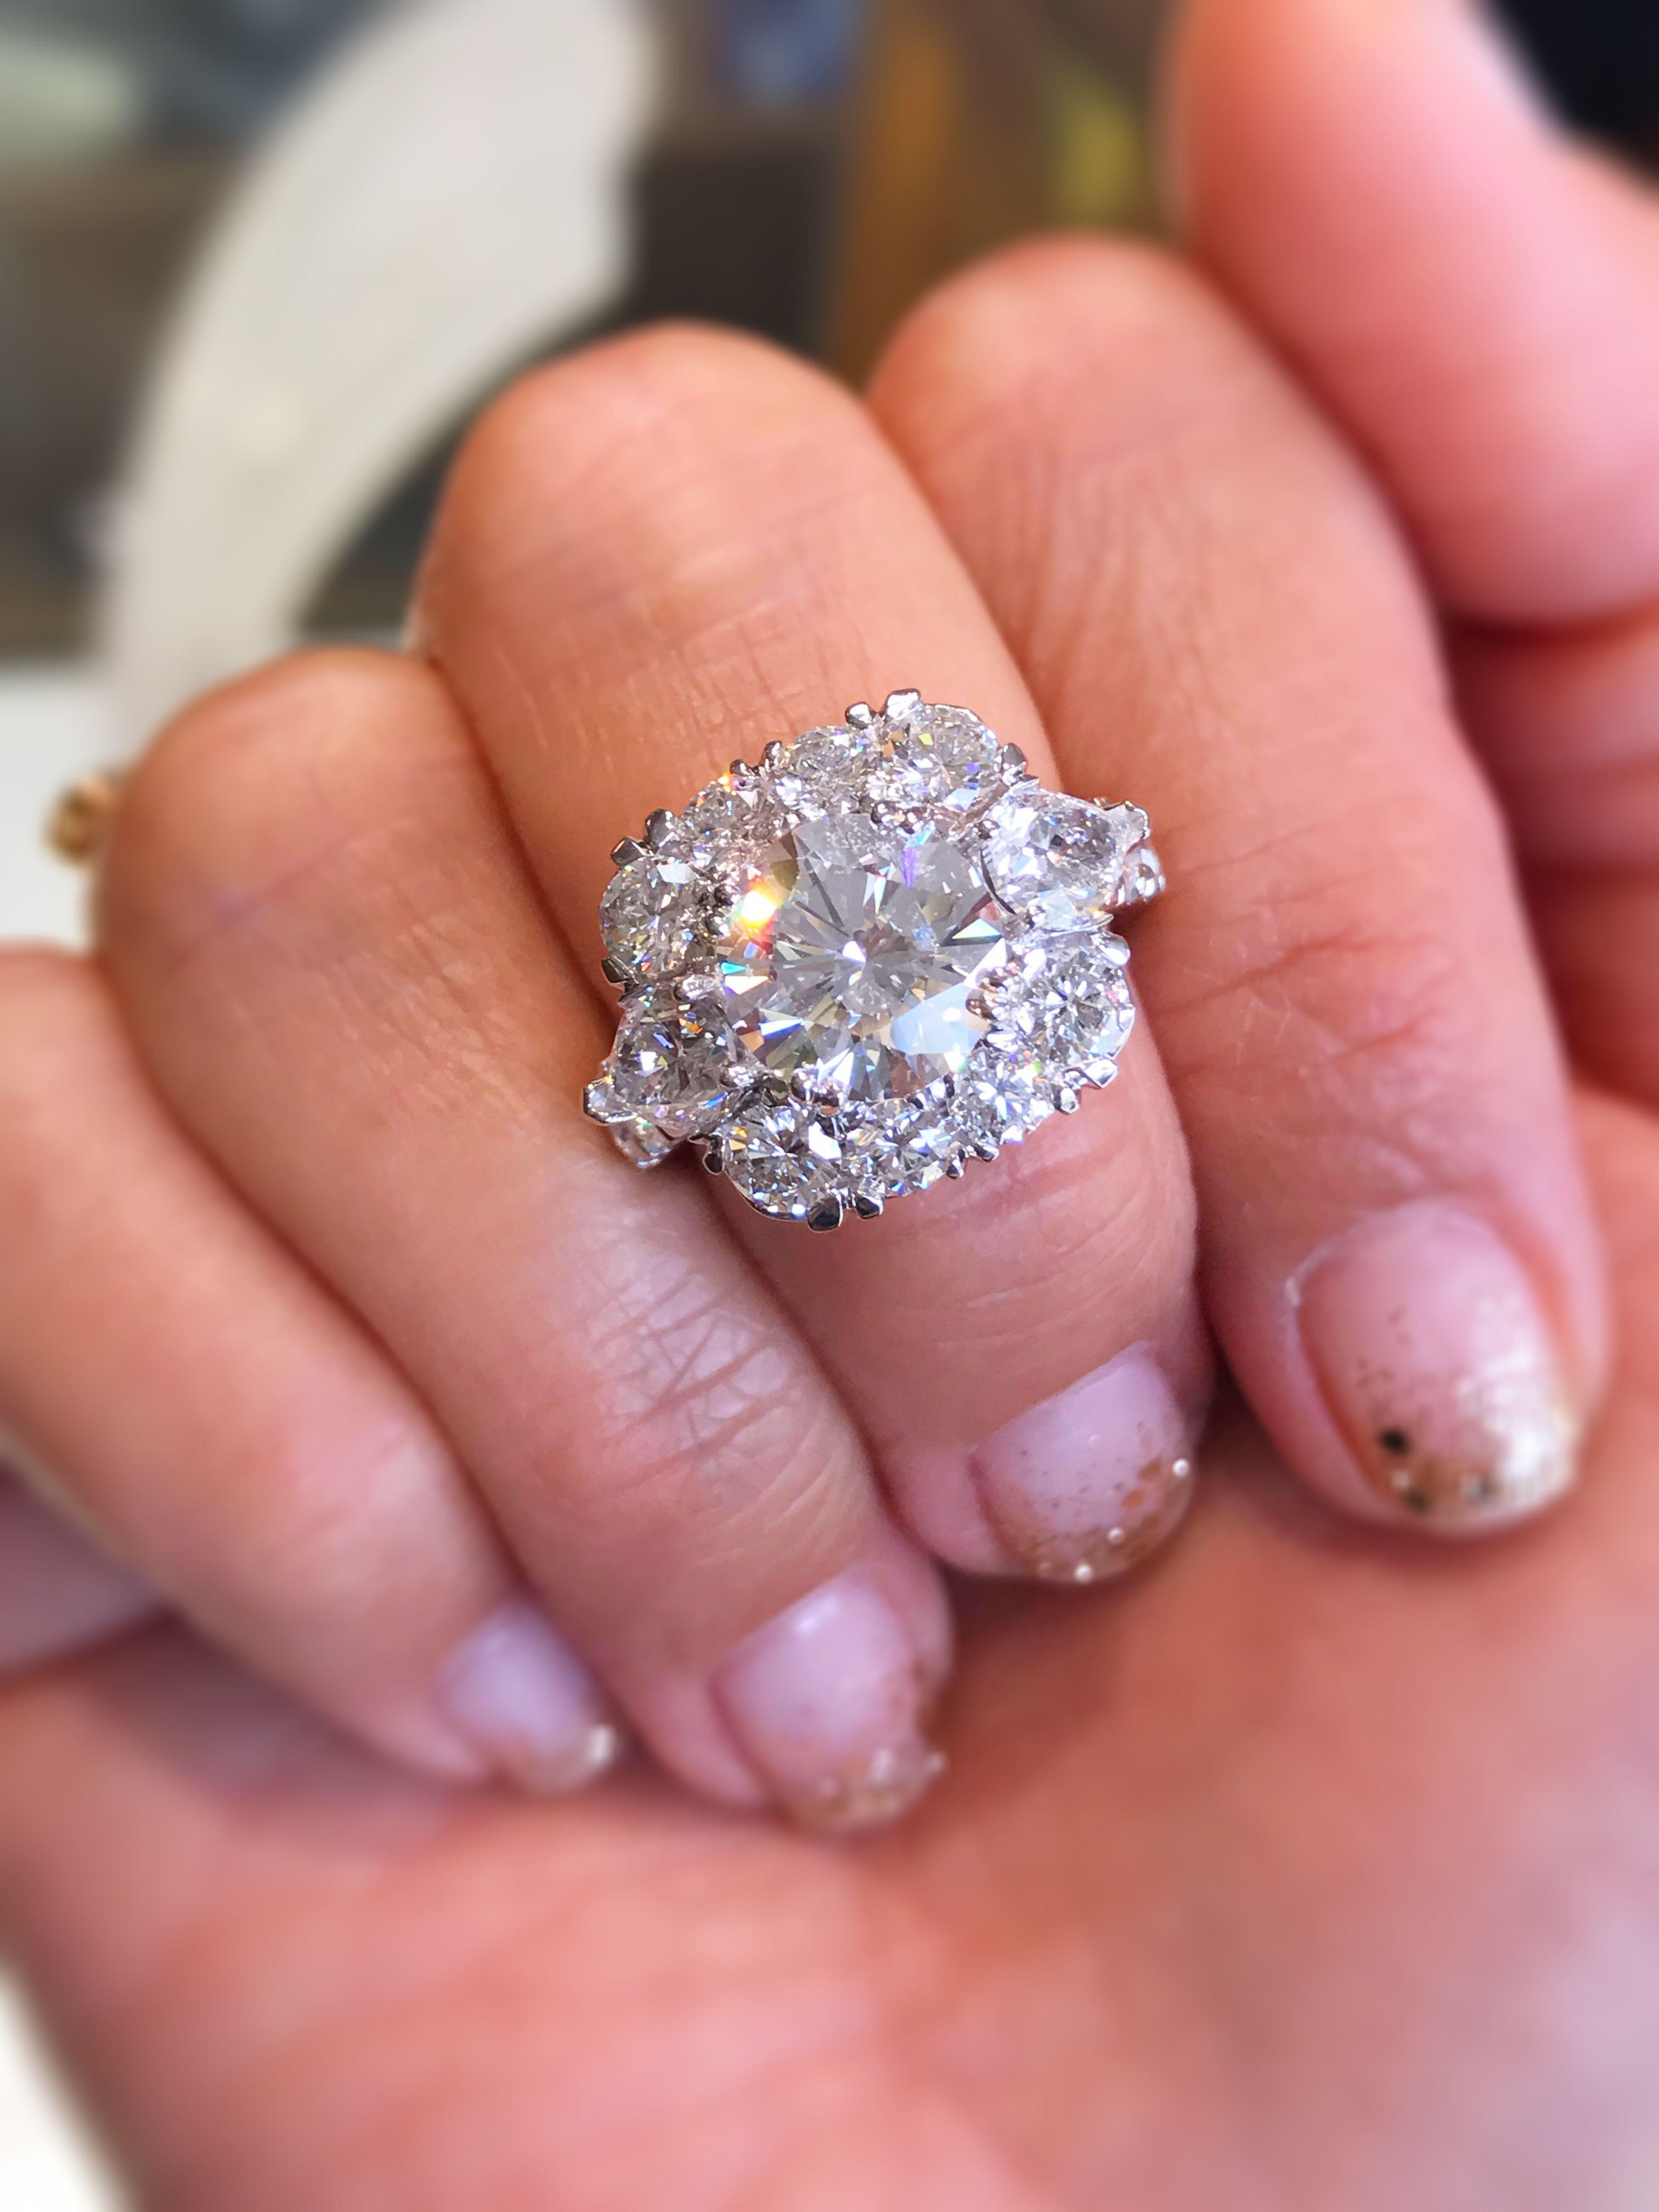 Custom engagement ring with impressive diamond halo and pear shape ...